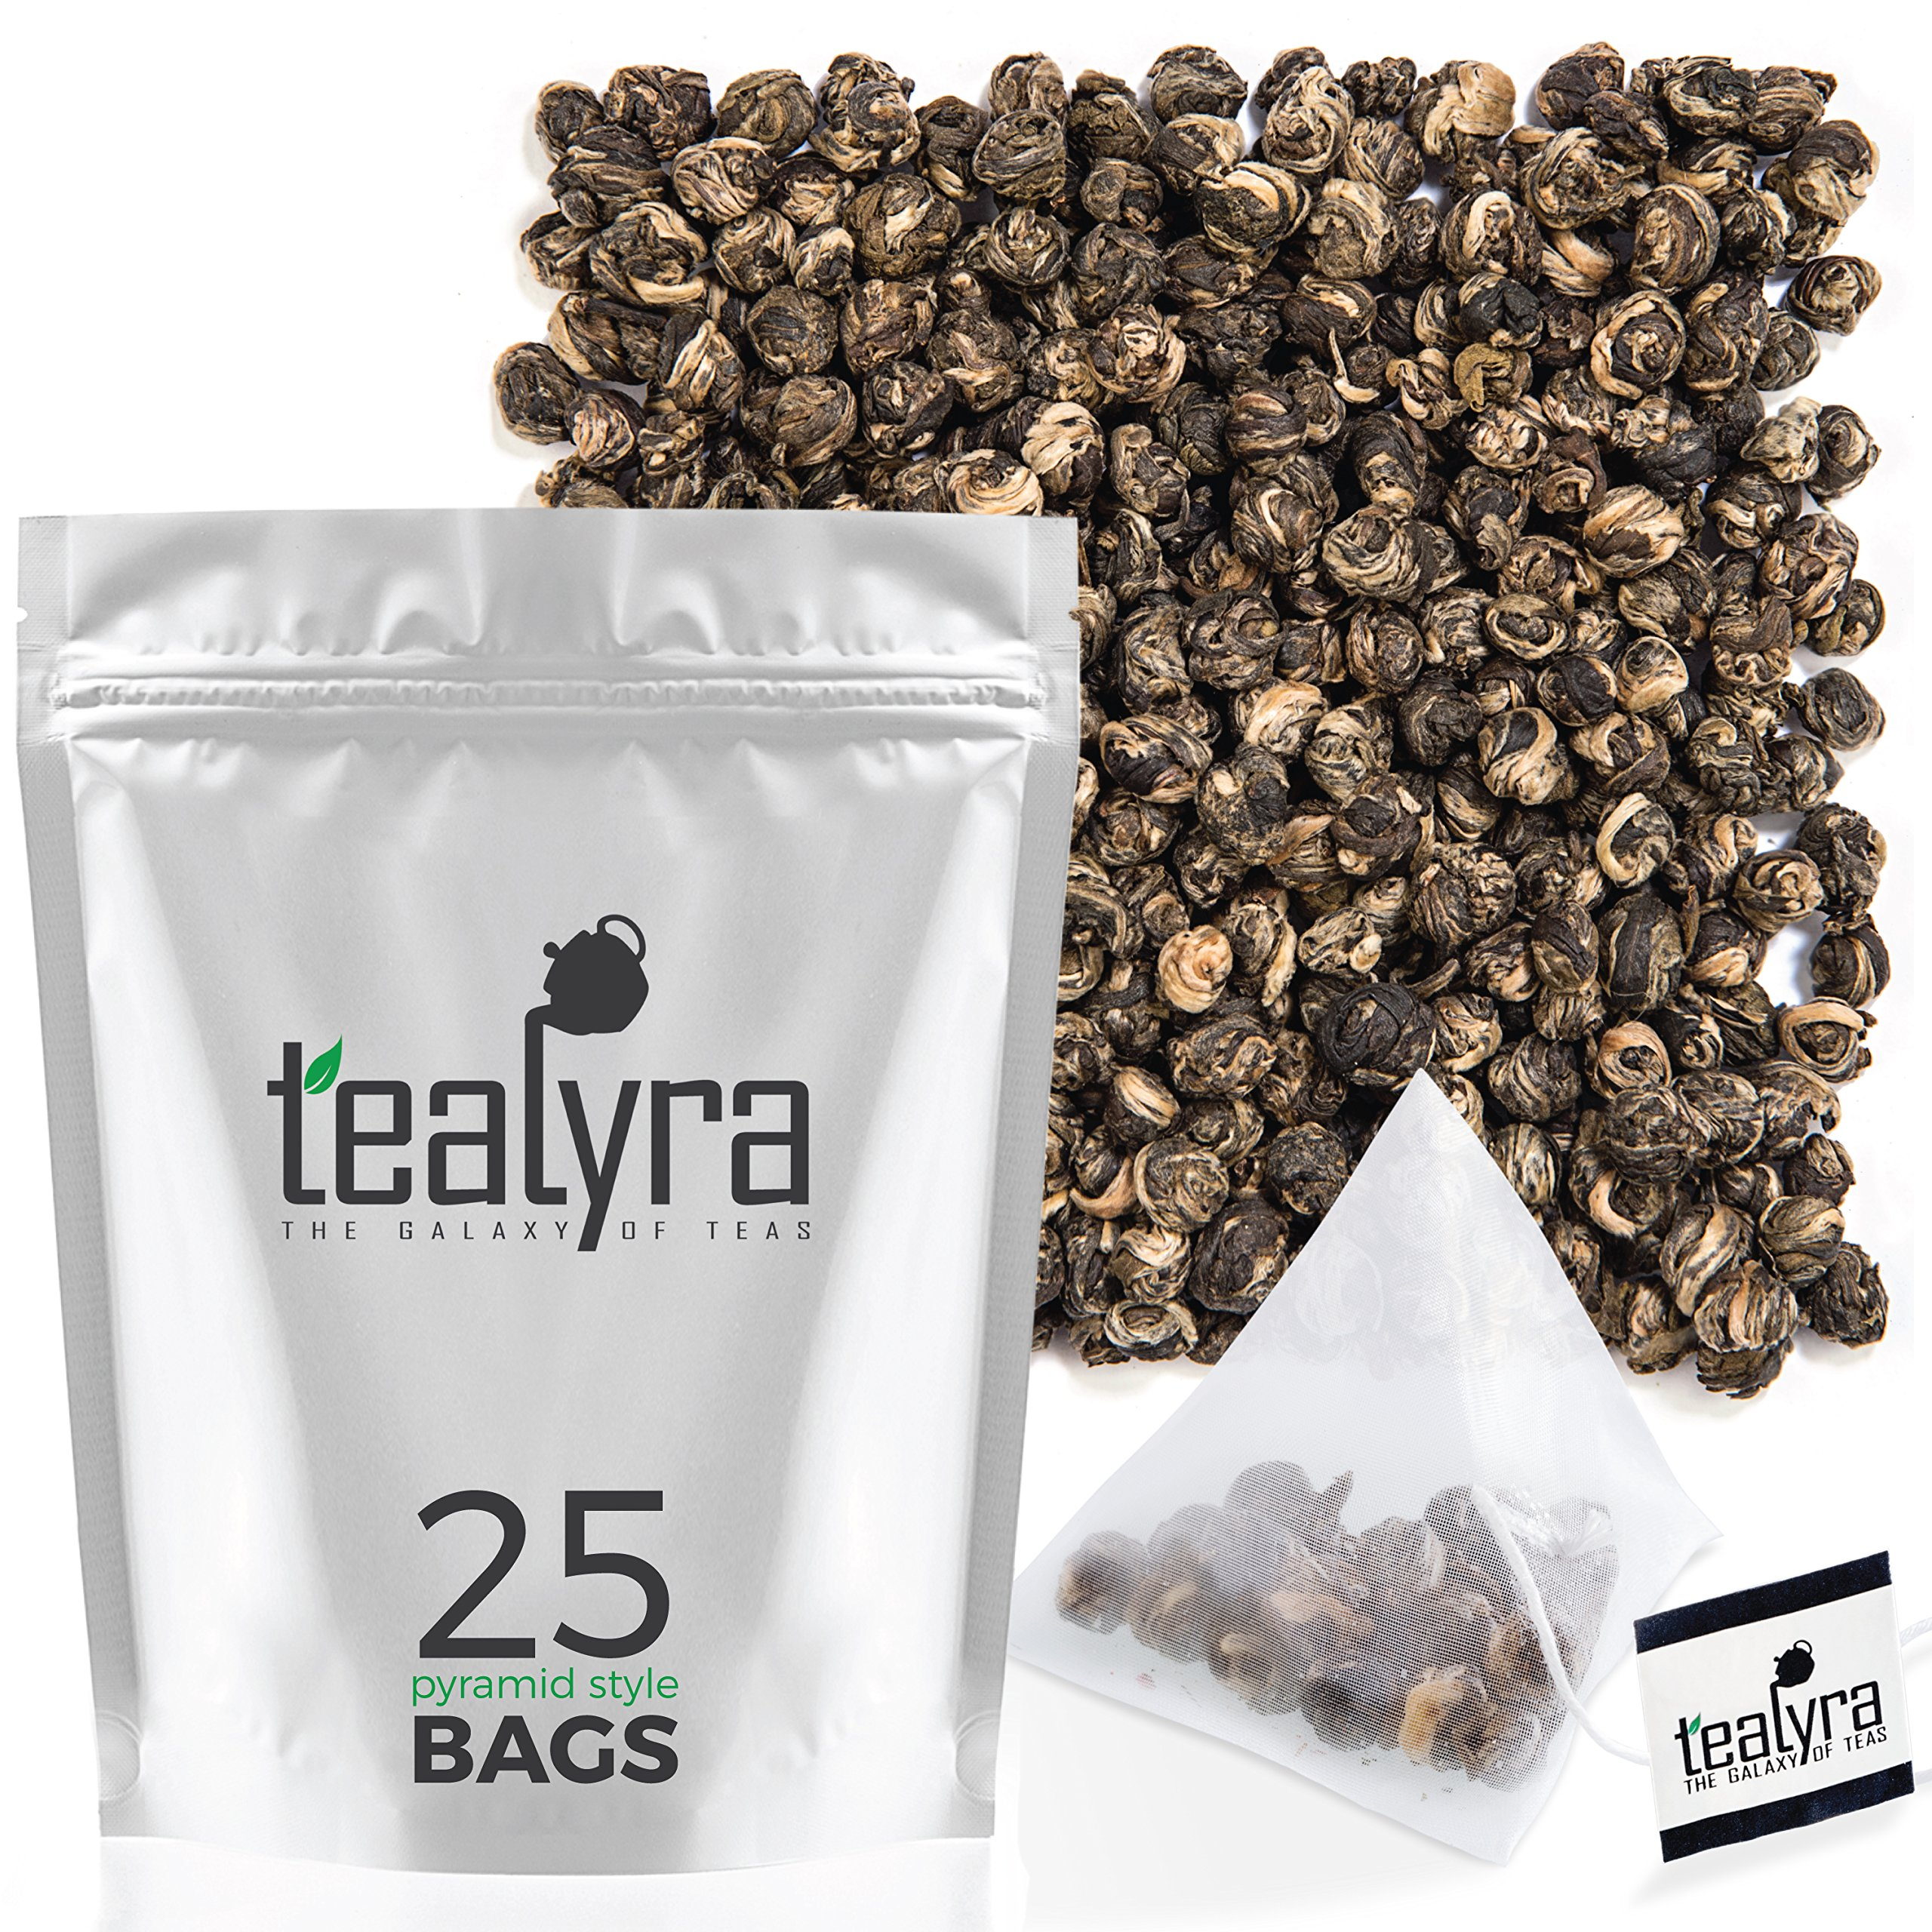 Tealyra - Imperial Jasmine Dragon Pearls Tea Pyramids Bags - Green Tea Loose Leaf - Organically Grown - 25 Sachets (Net. 2oz)